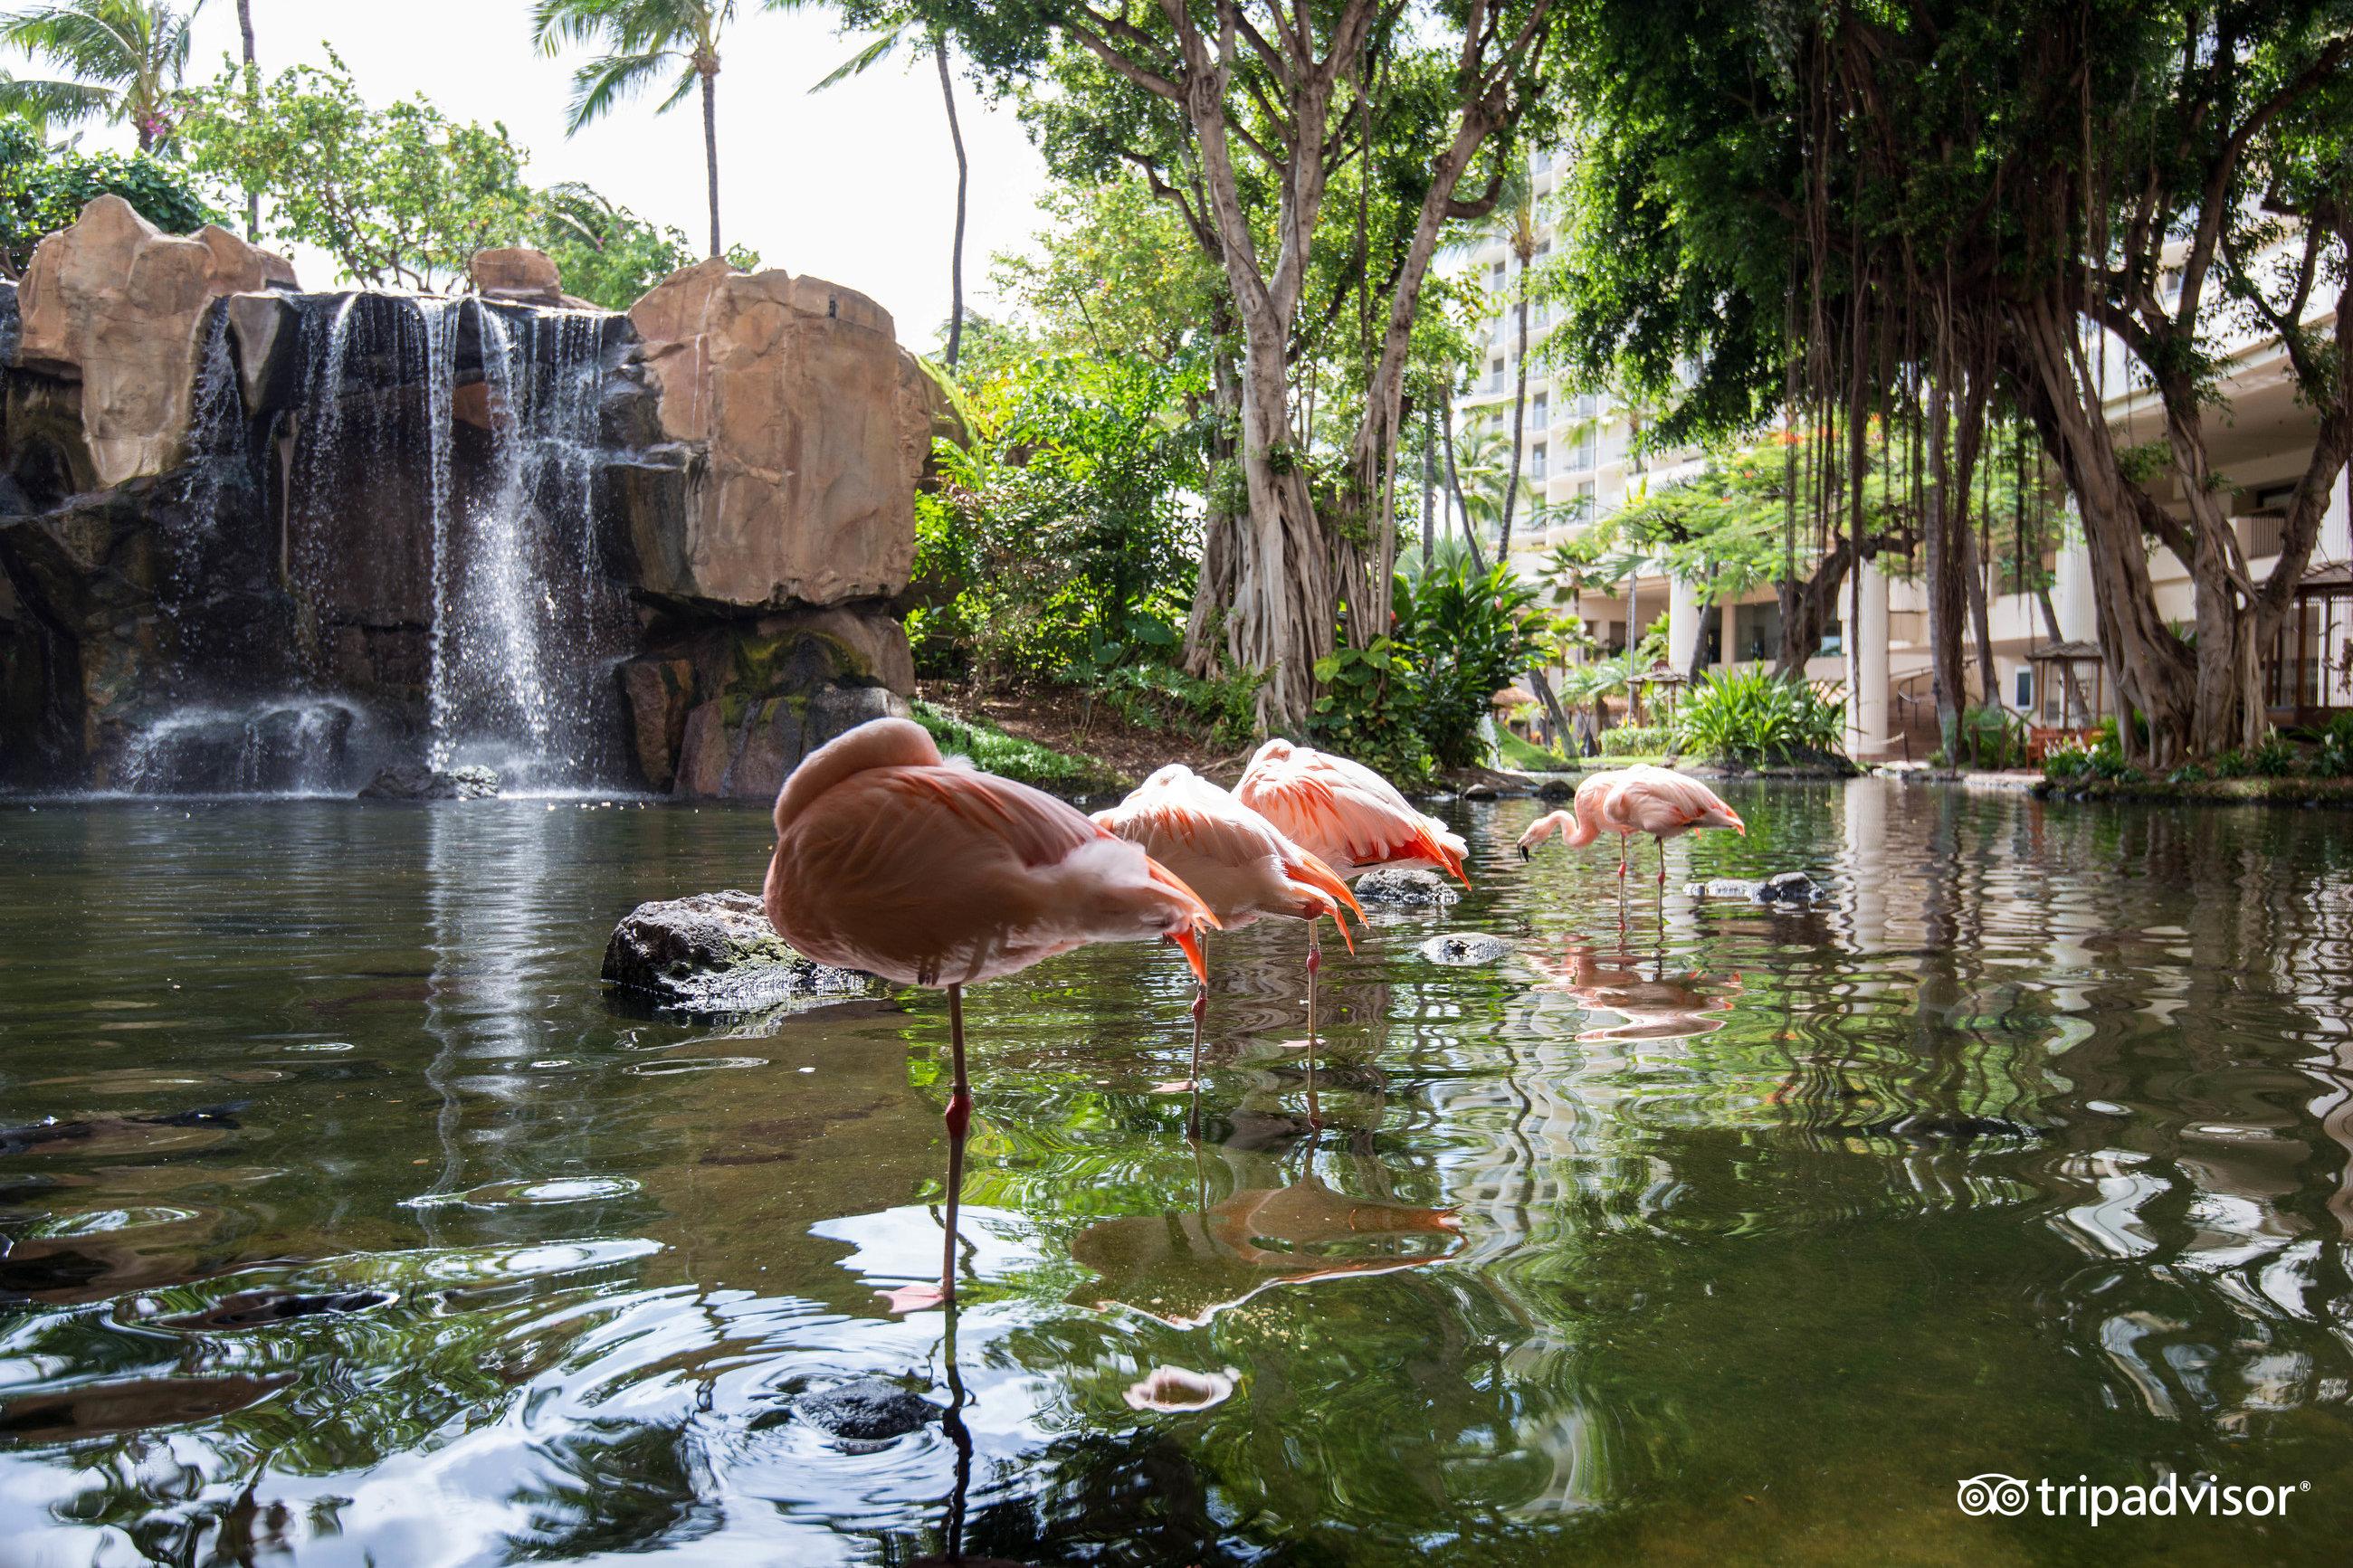 westin maui resort & spa (hi) 2017 review - family vacation critic